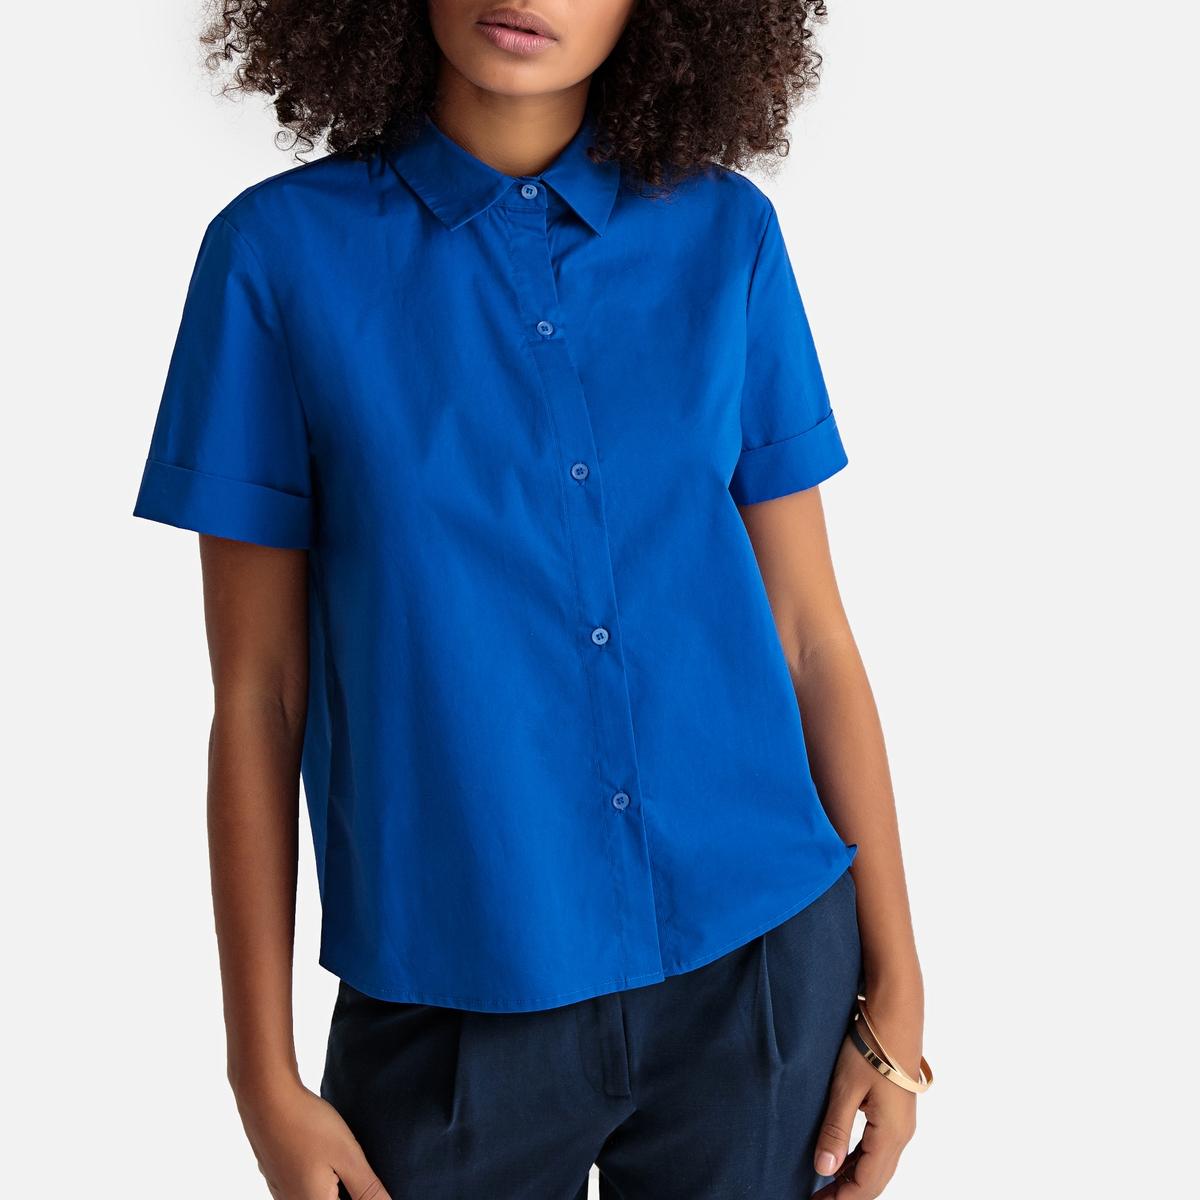 Рубашка La Redoute С короткими рукавами 34 (FR) - 40 (RUS) синий цена 2017